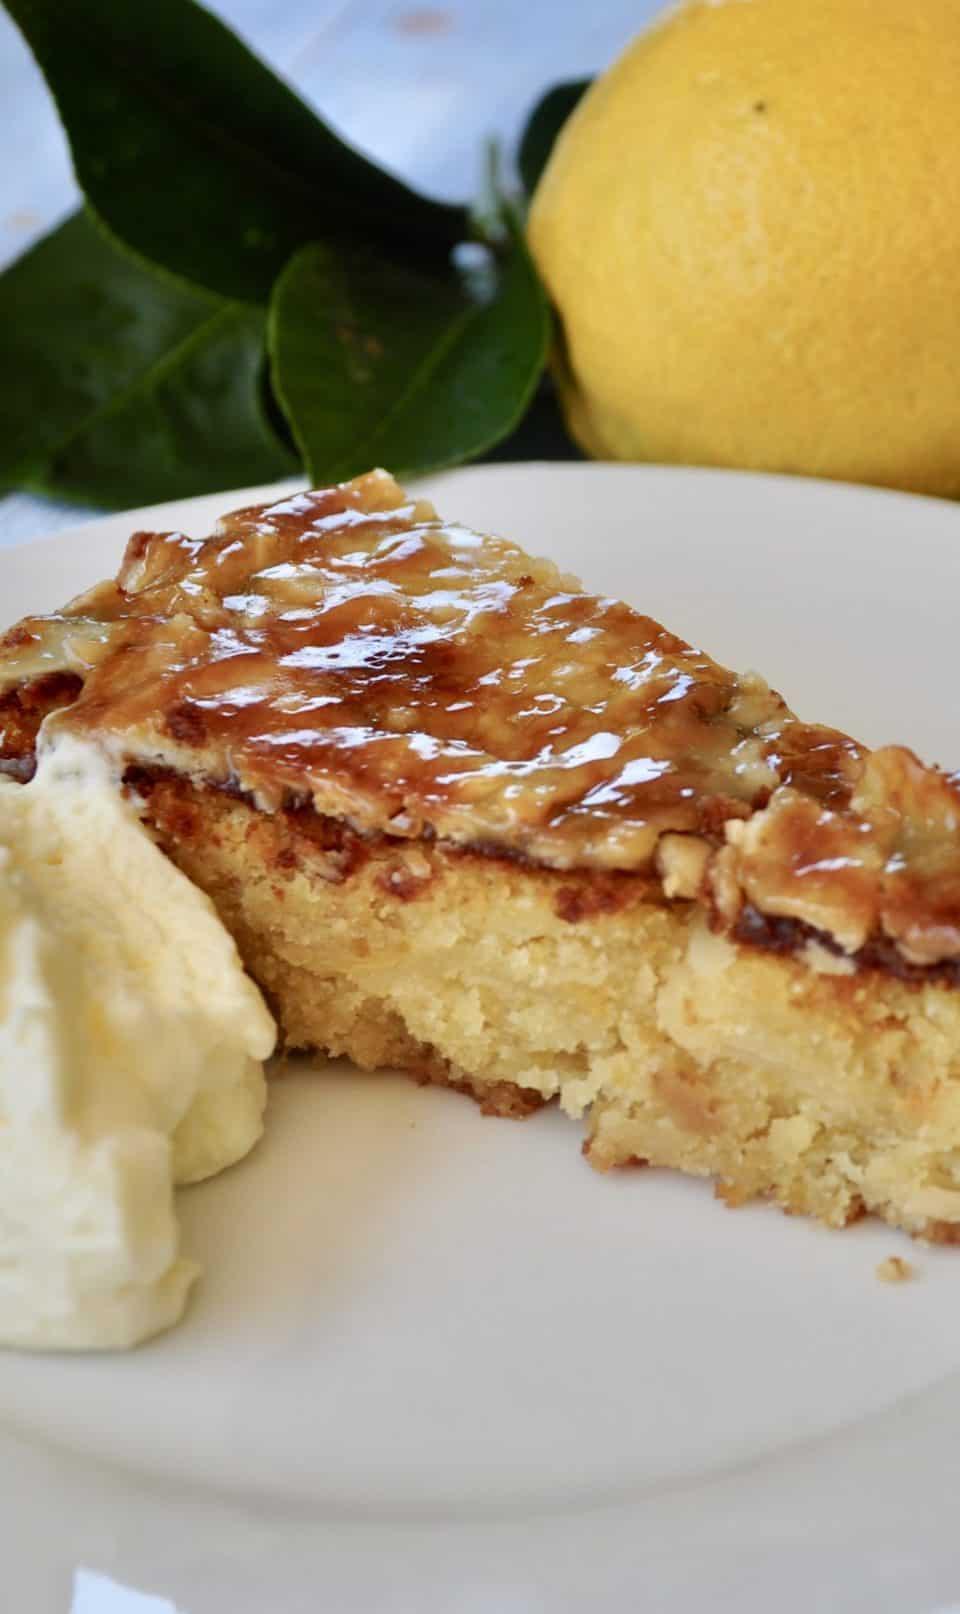 Italian lemon, almond and white chocolate cake - gluten free